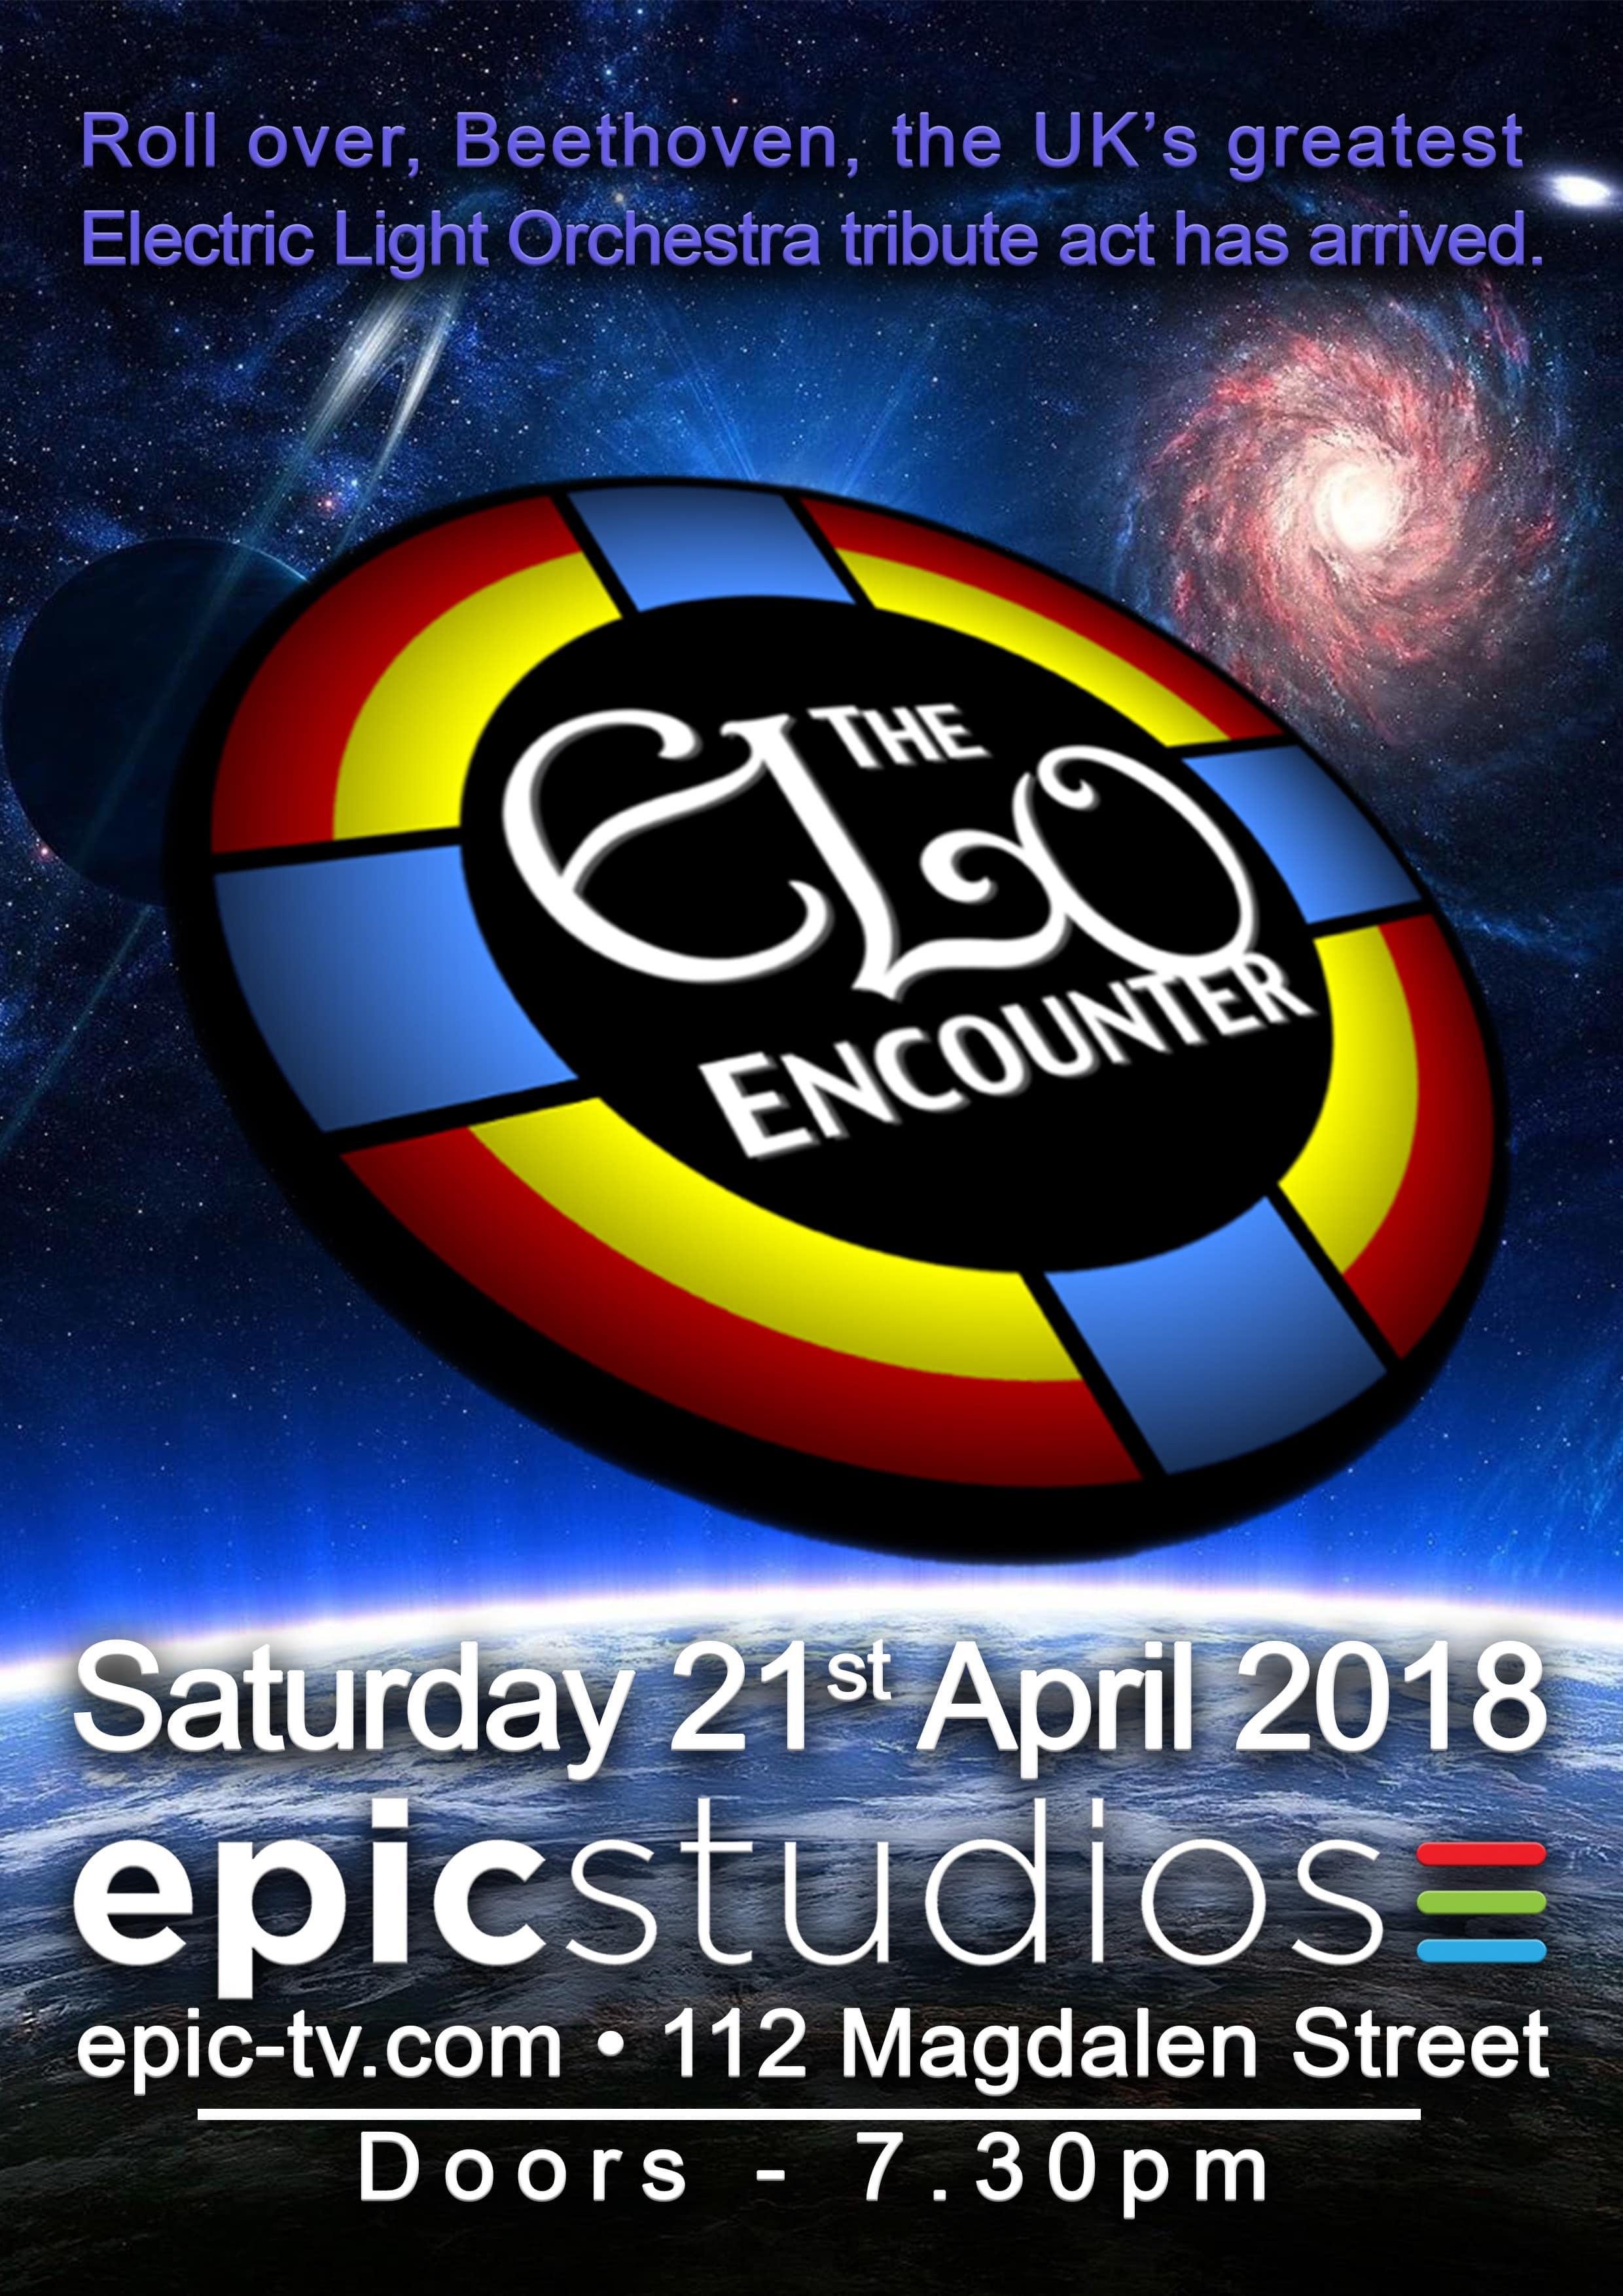 Epic Studios Norwich - ELO Encounter Poster